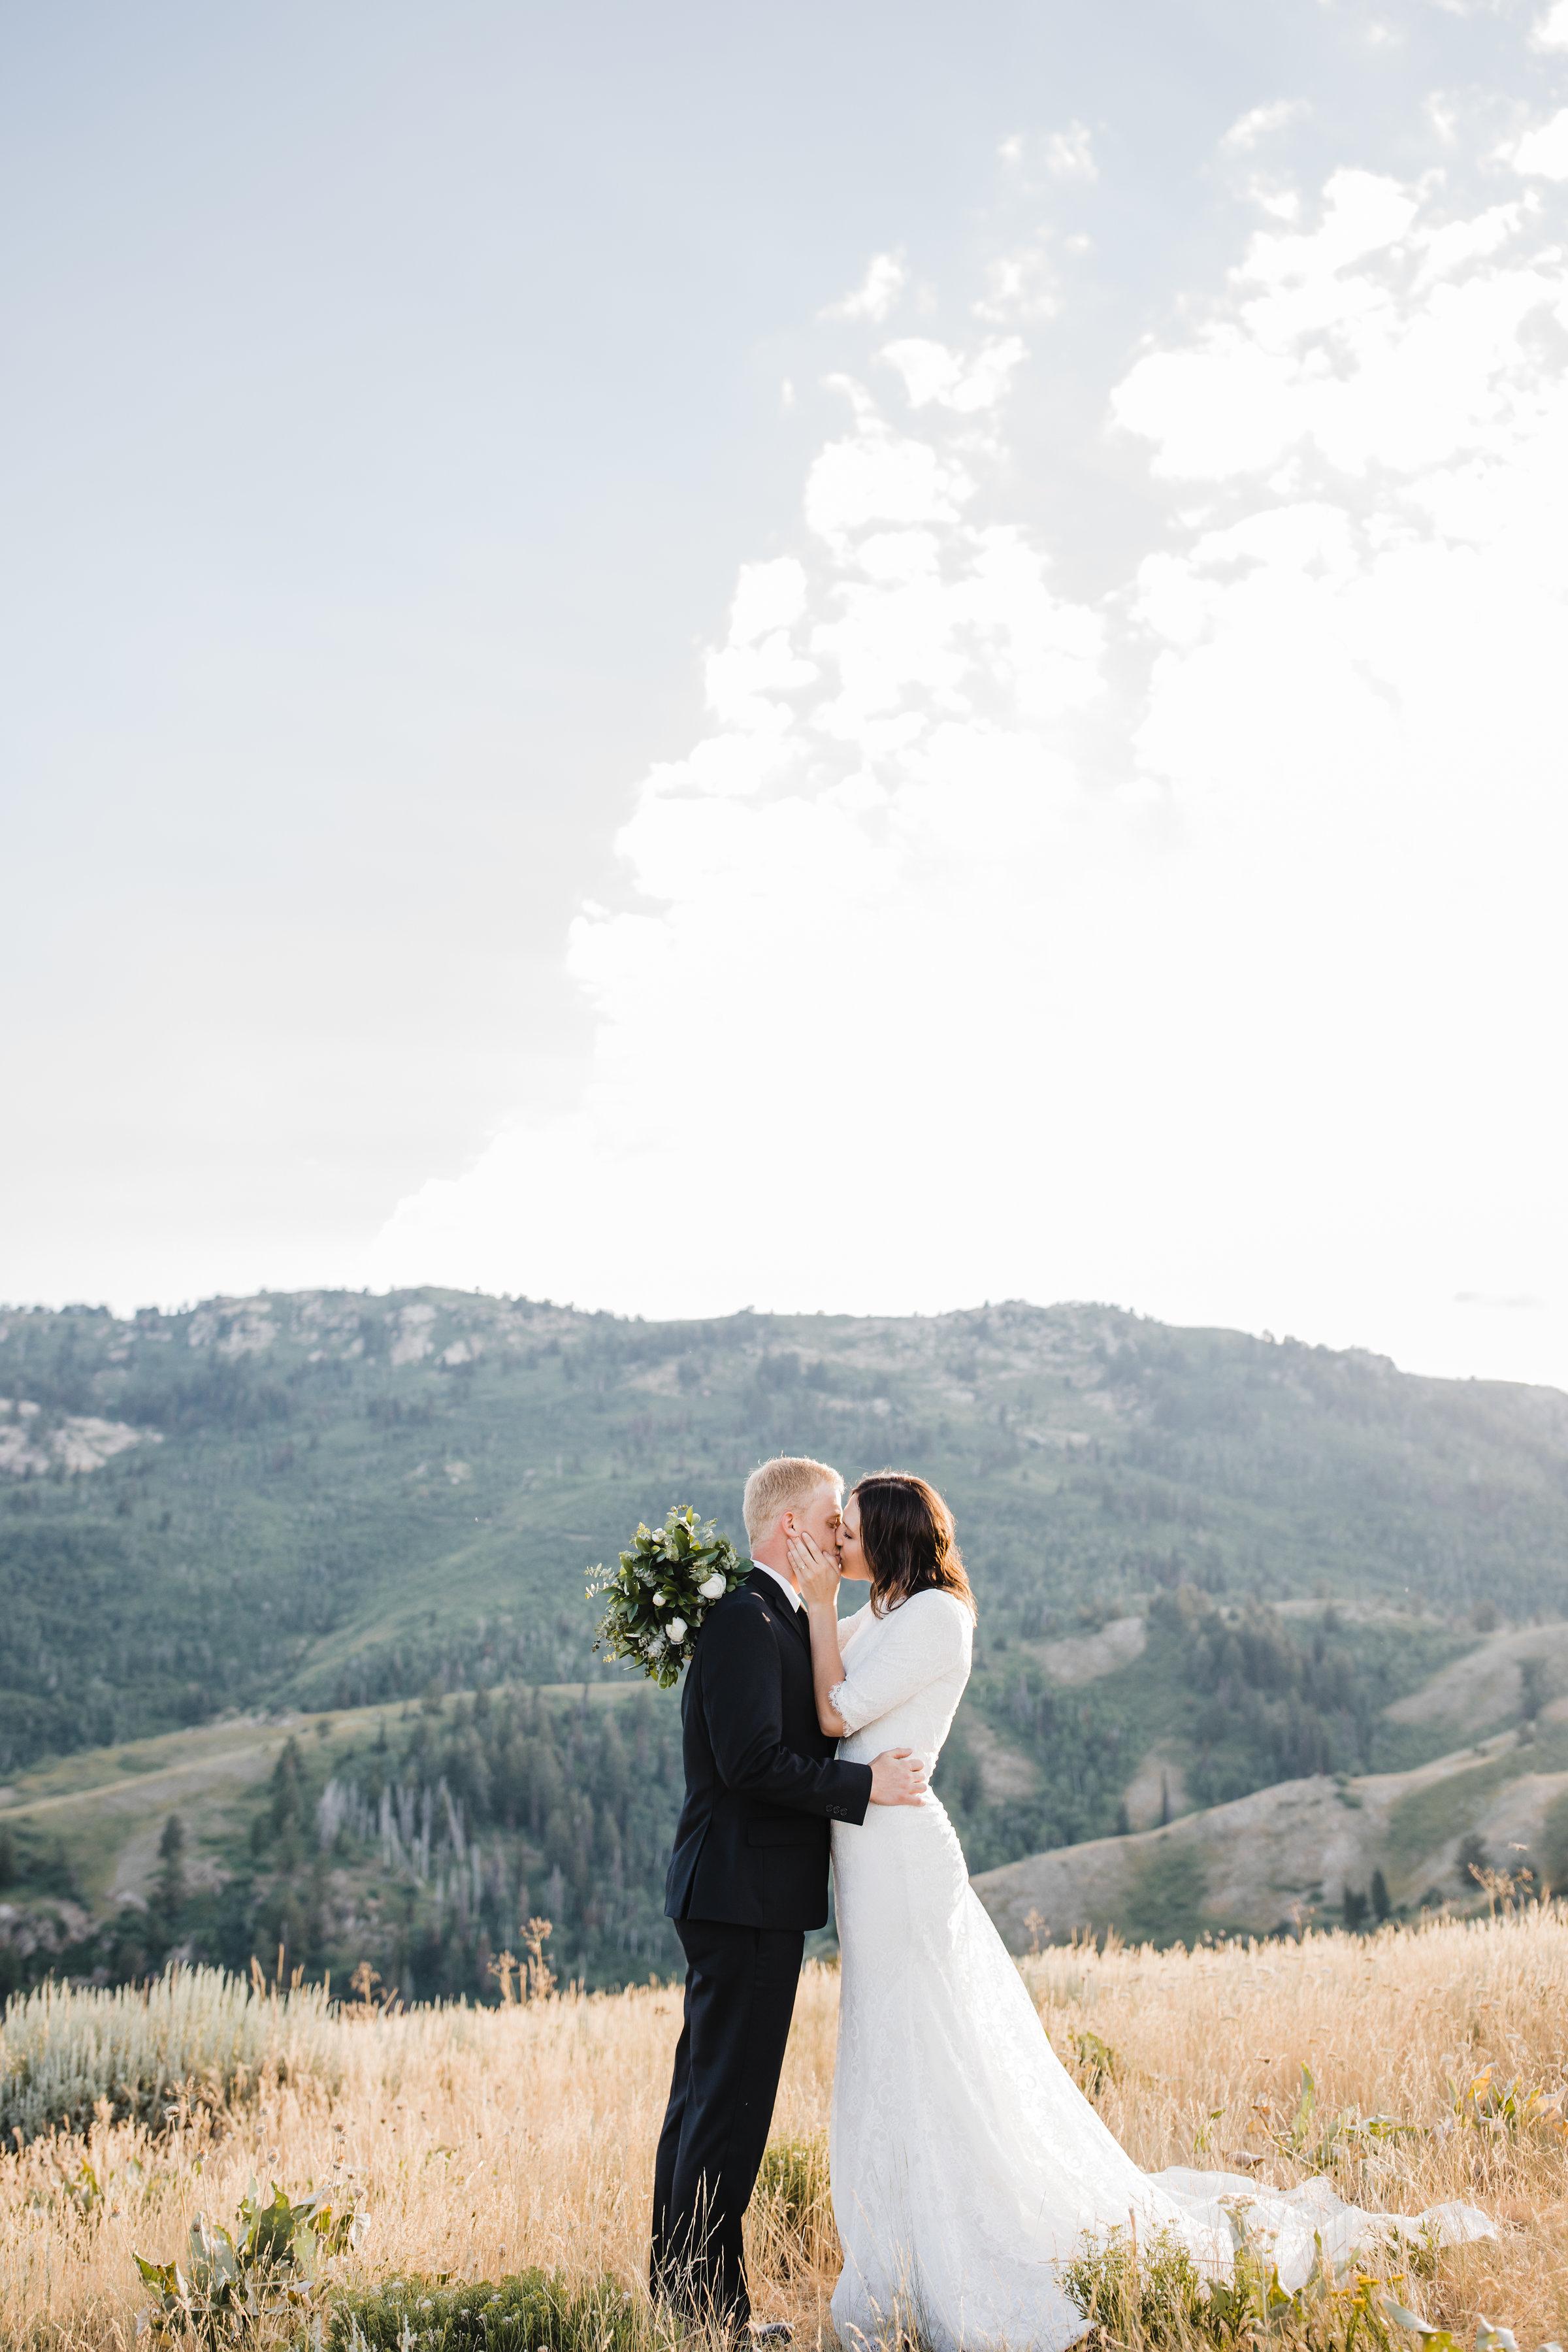 brigham city wedding photographer mountain bridals kissing sunset romantic